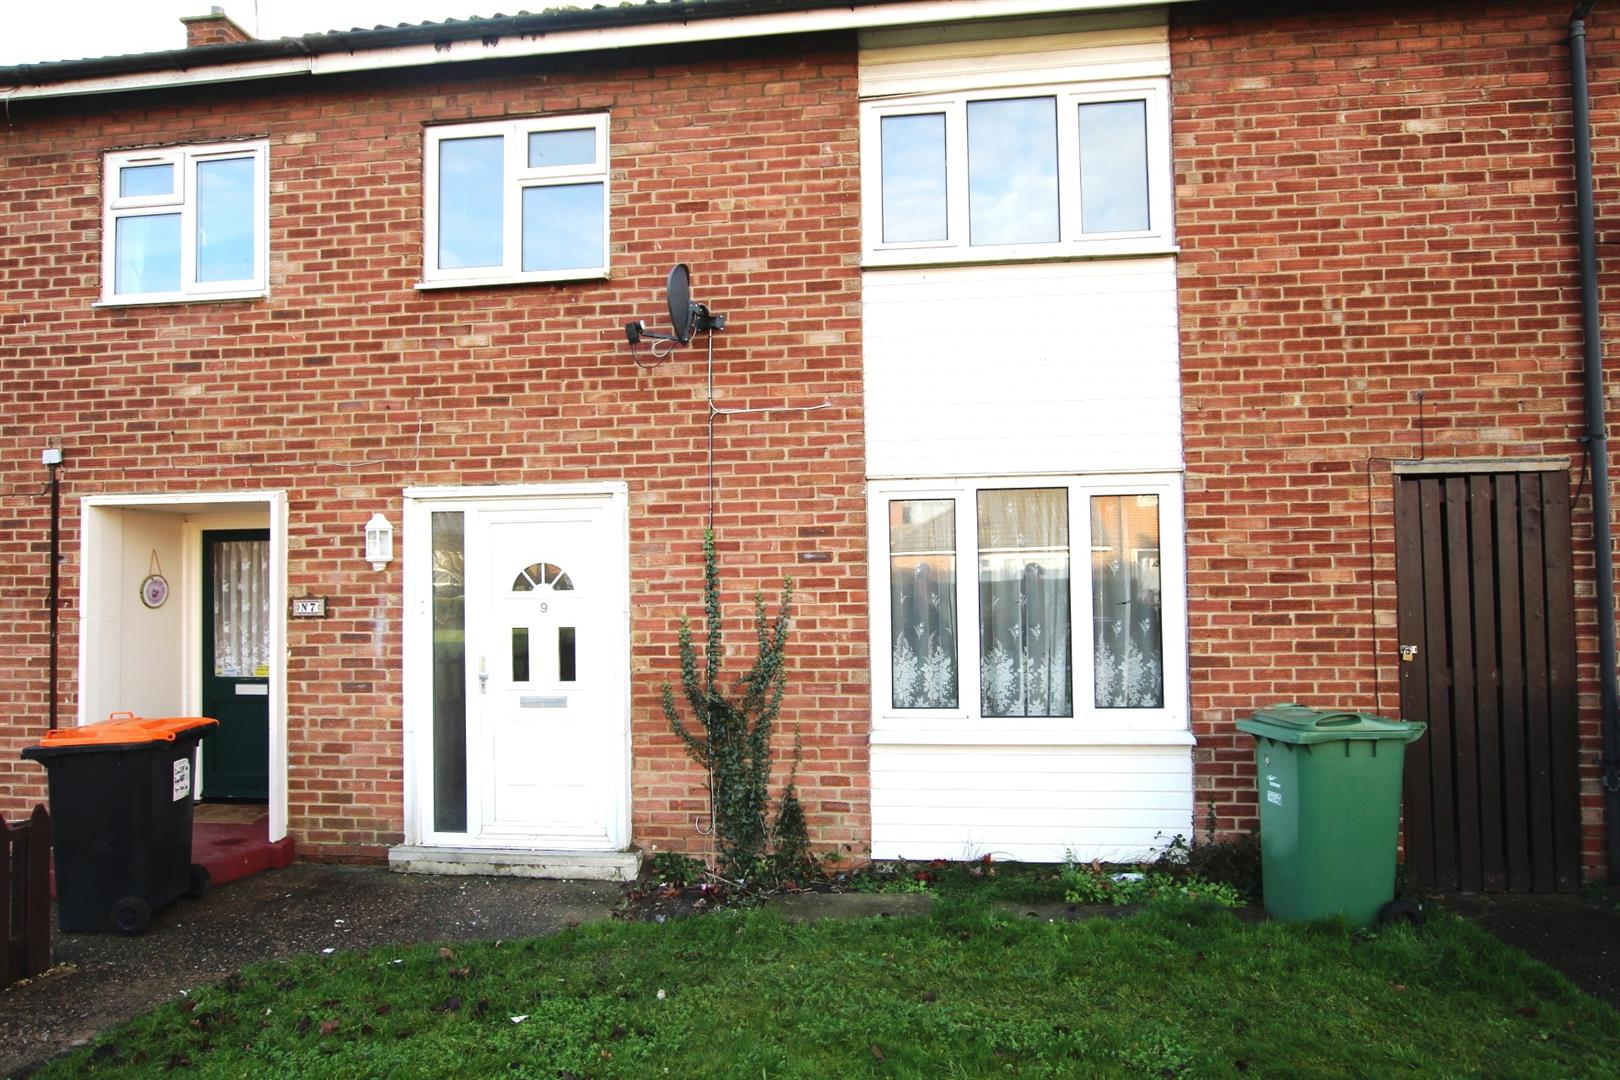 3 Bedrooms Terraced House for rent in Kent Road, Houghton Regis